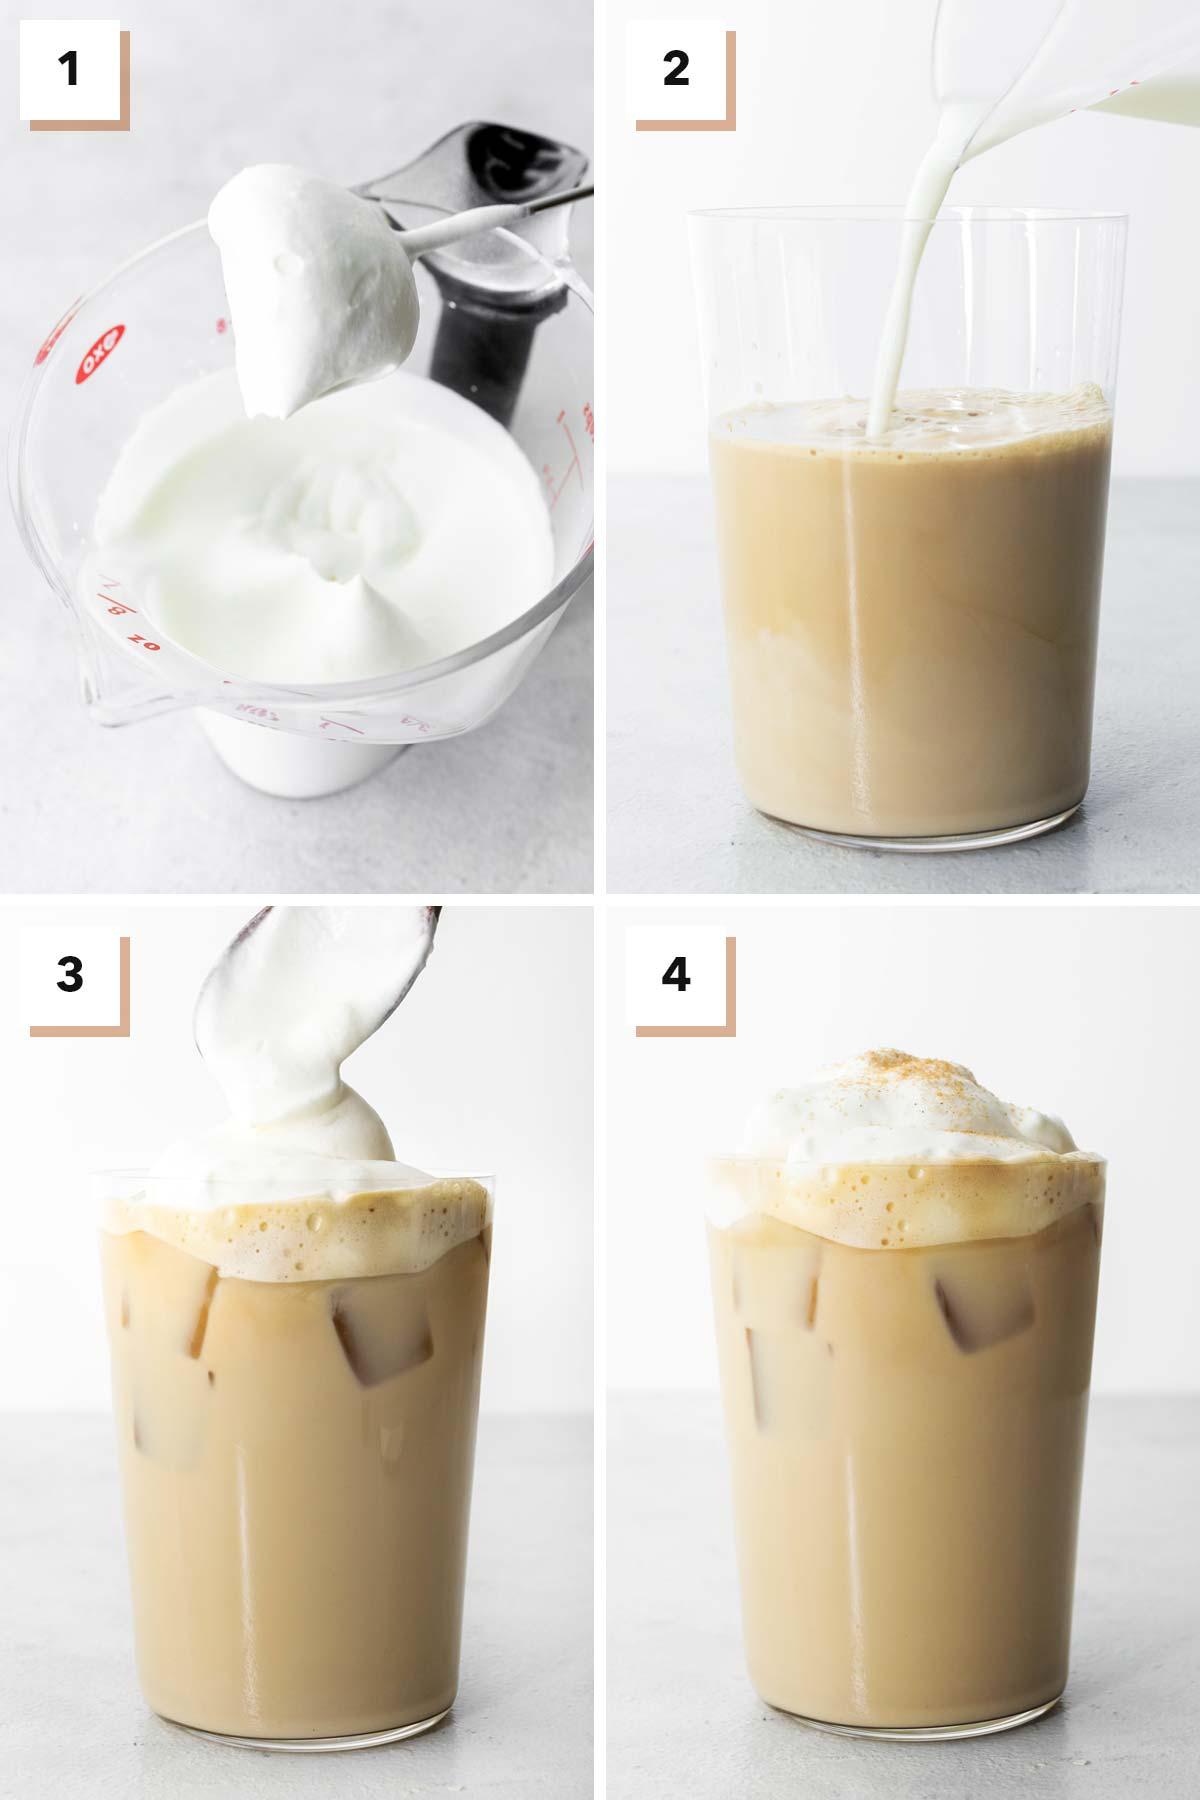 Steps to make Starbucks Iced Cinnamon Dolce Latte copycat drink.